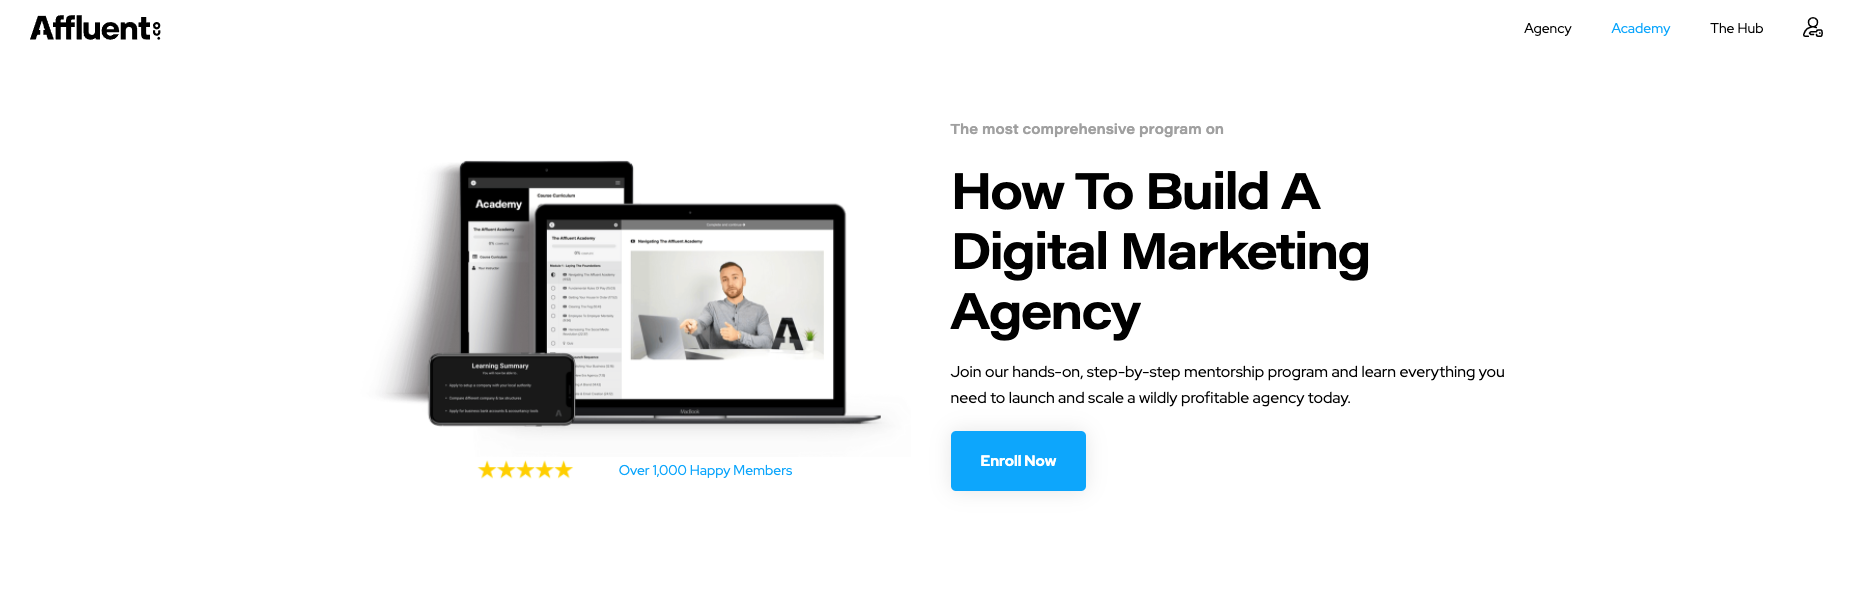 Affluent Academy Review - Legit Marketing Agency Course?